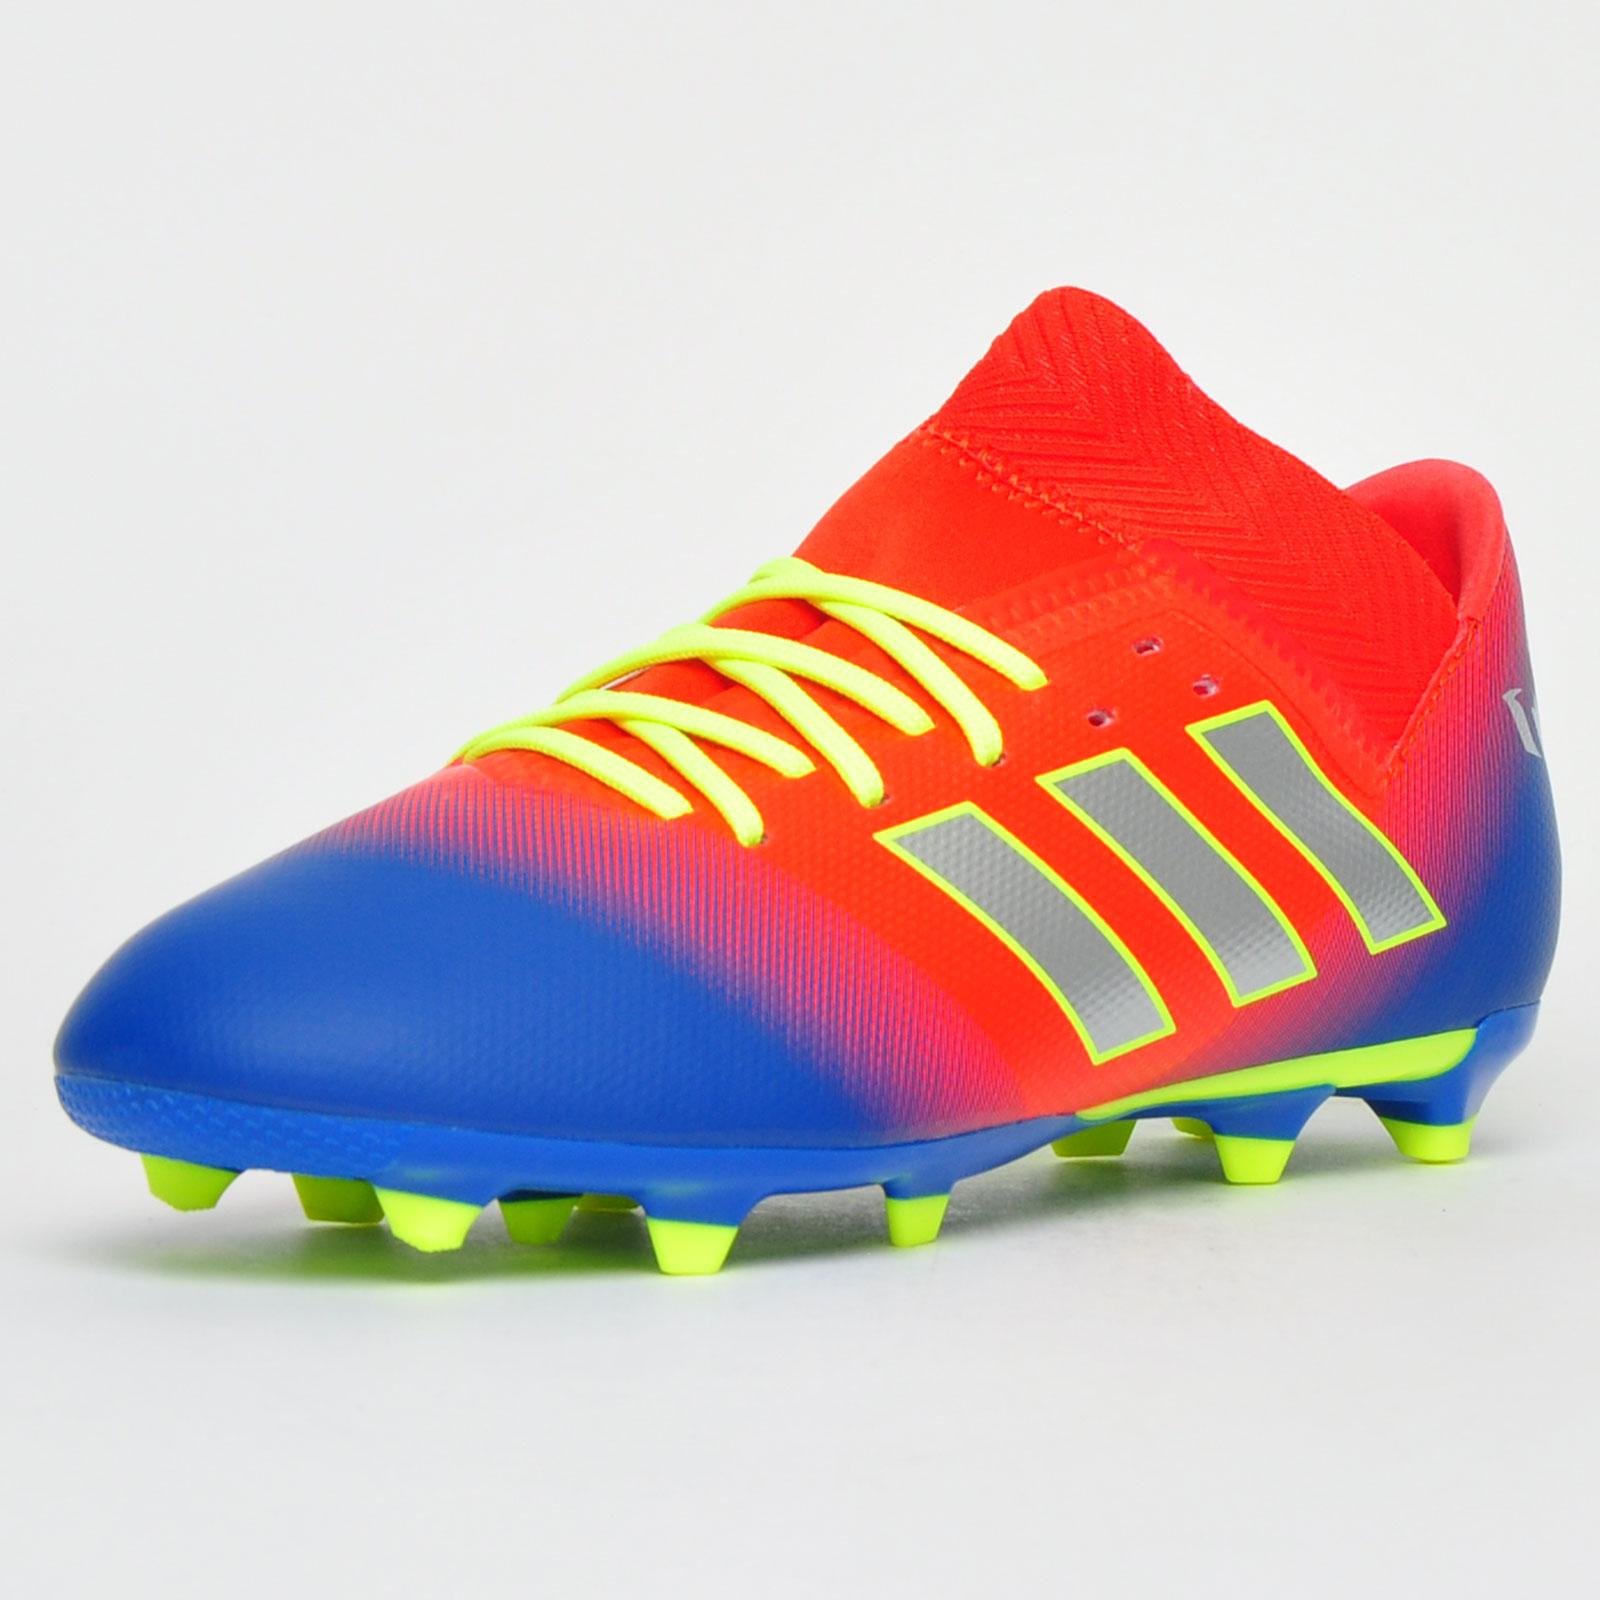 Adidas Nemeziz Messi 18.3 FG Junior Kids Boys Football Soccer ...